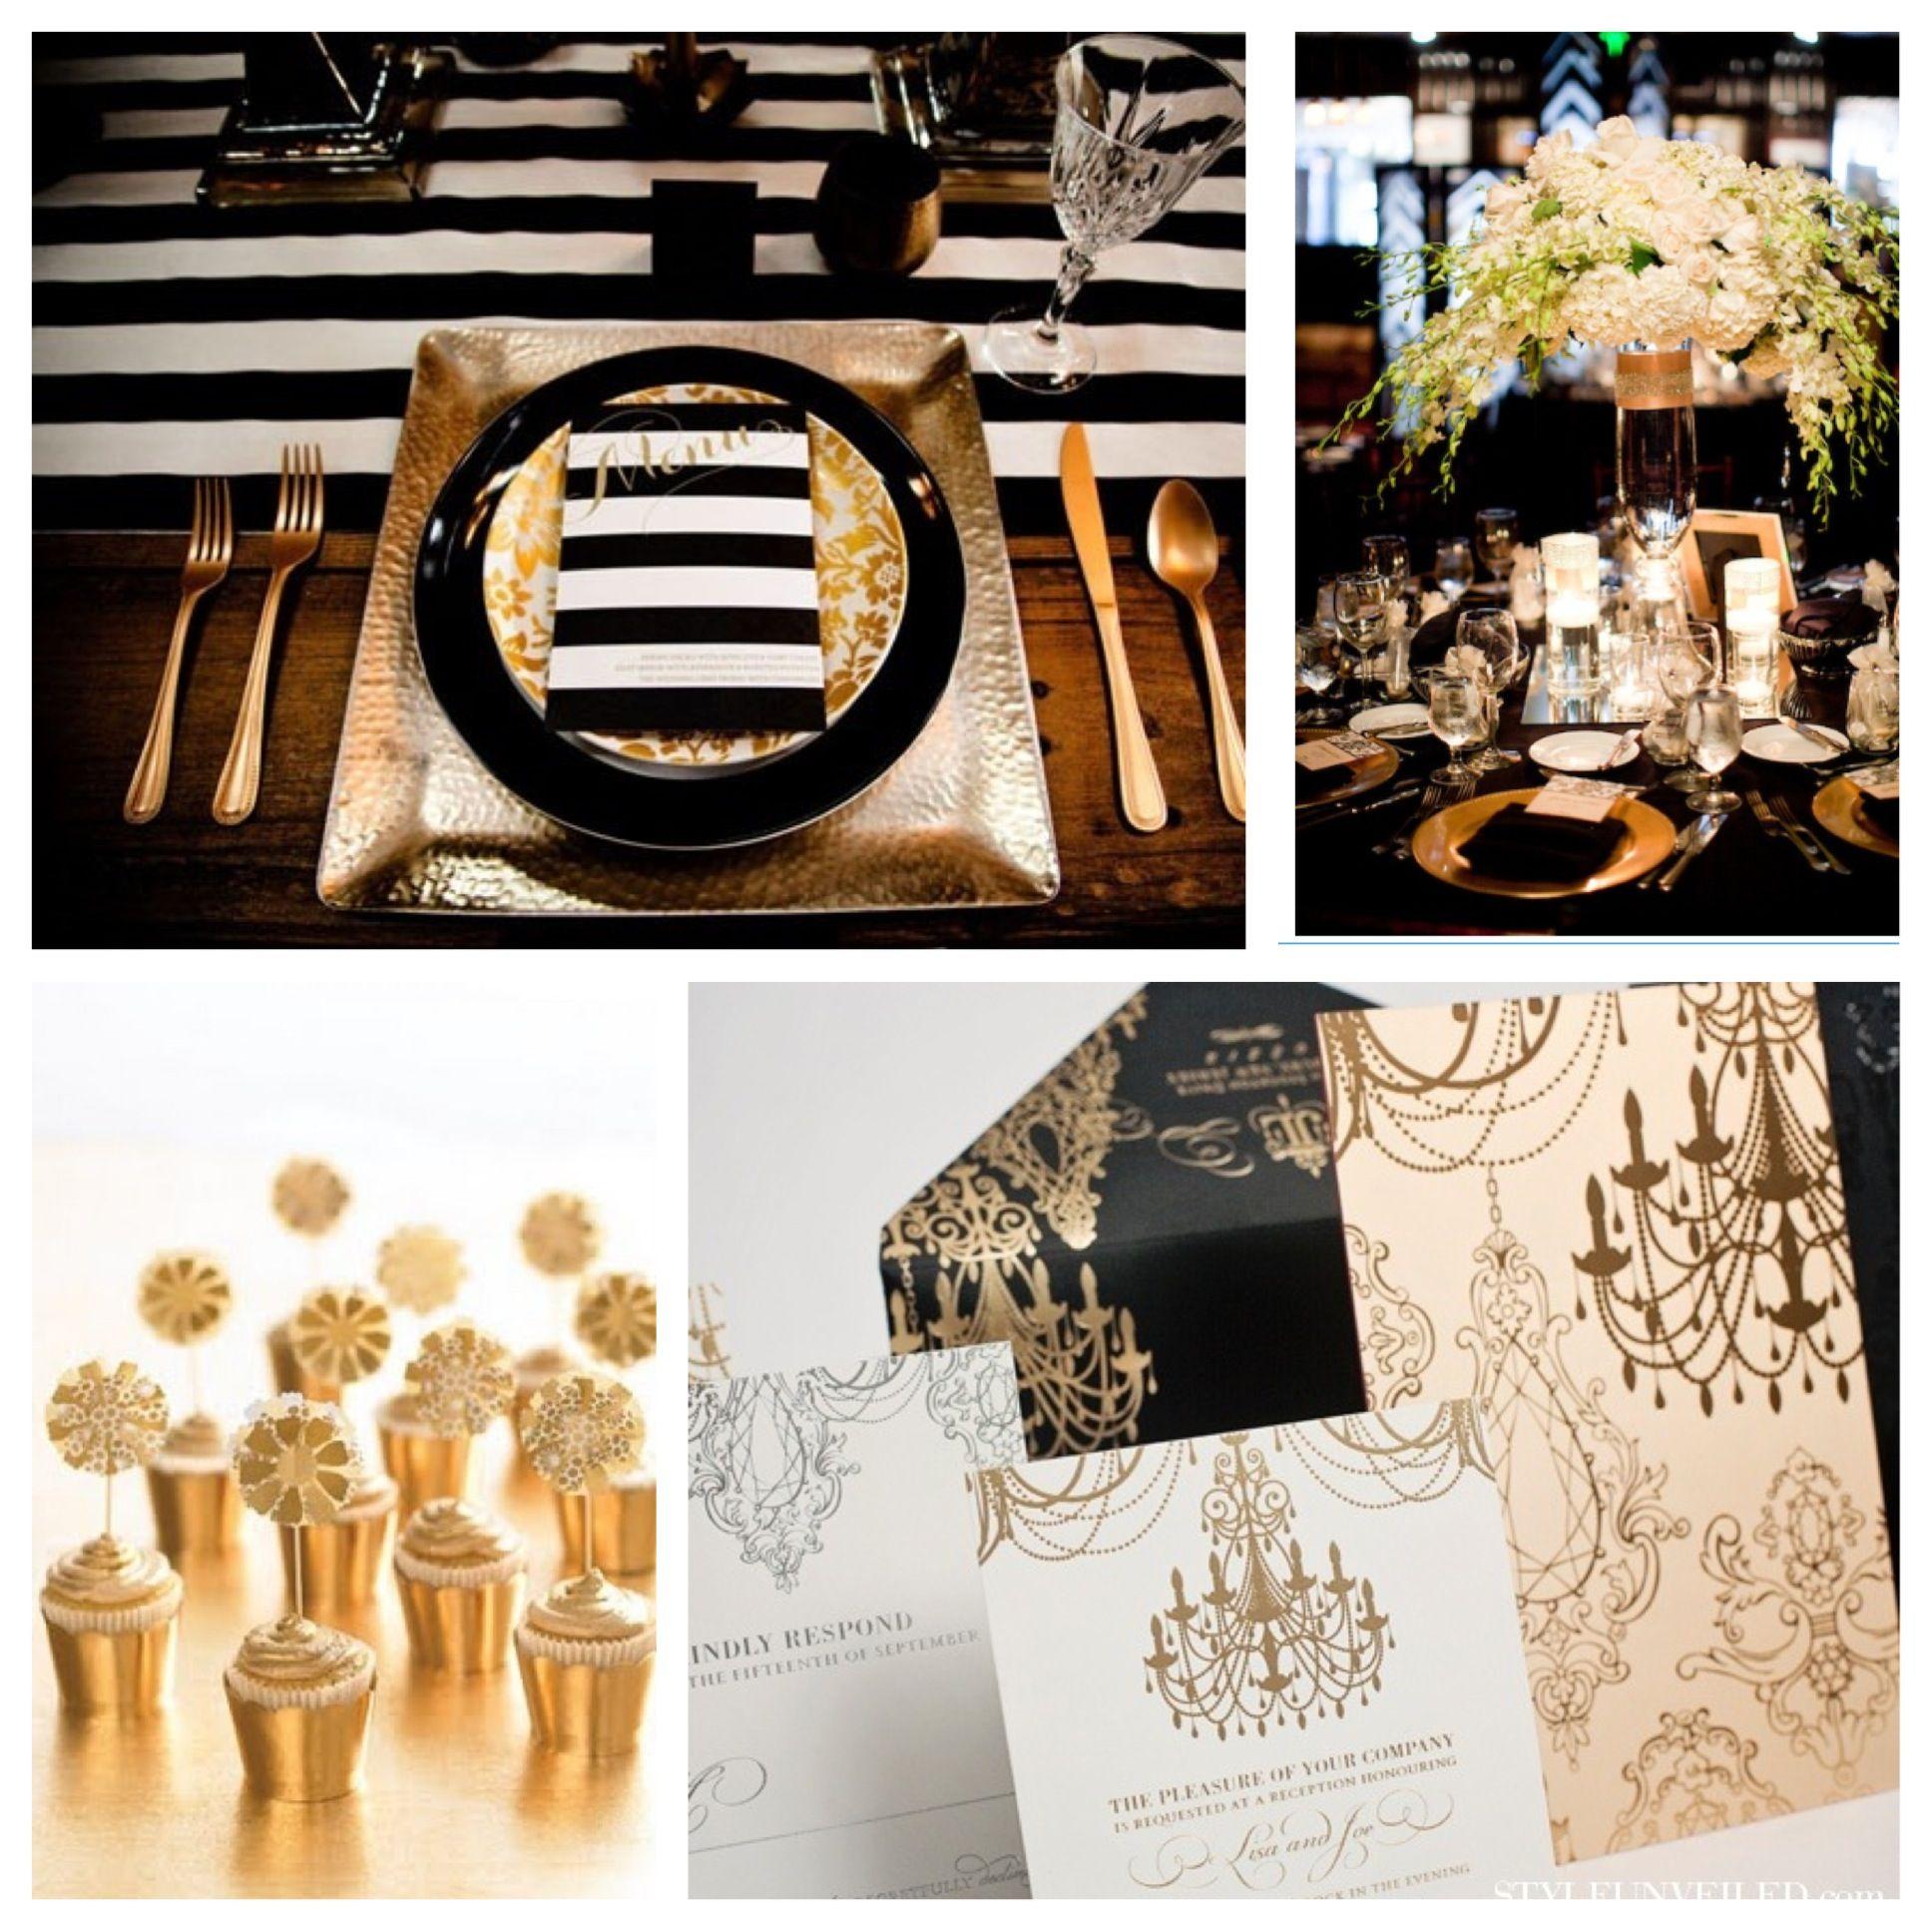 Black And Gold Wedding Reception Decorations: Gatsby/Glam Wedding Theme